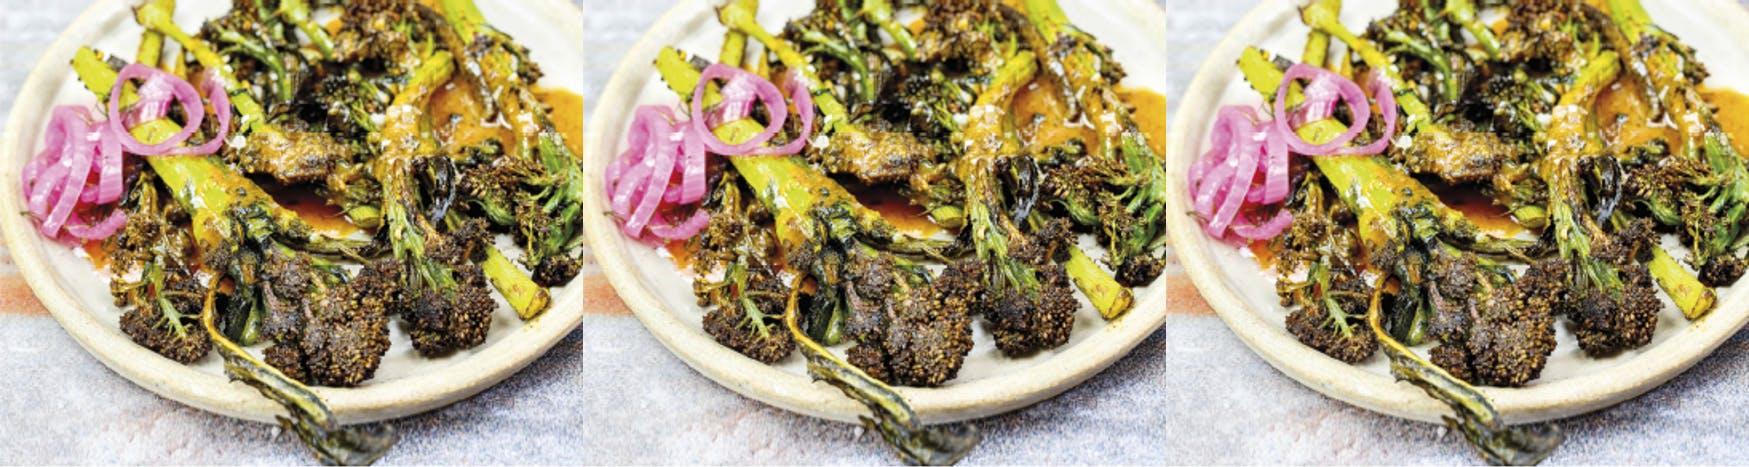 Tandoori Purple Broccoli with Masala Sauce